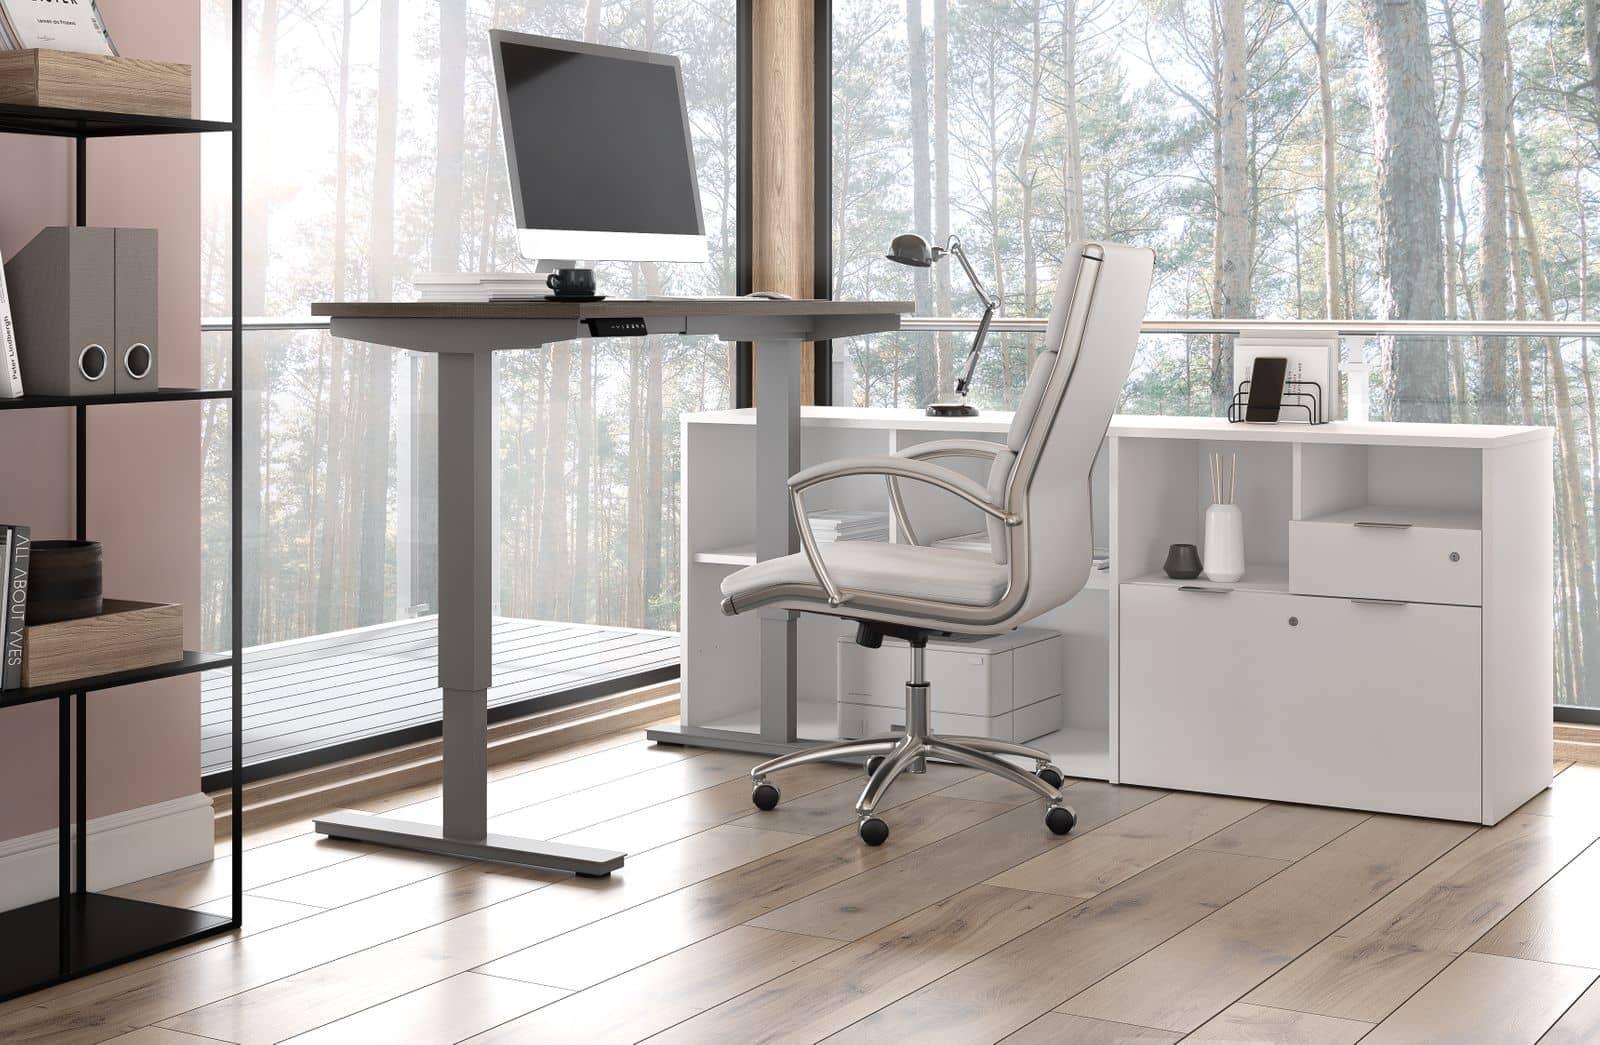 ergonomic height-adjustable L shaped desk